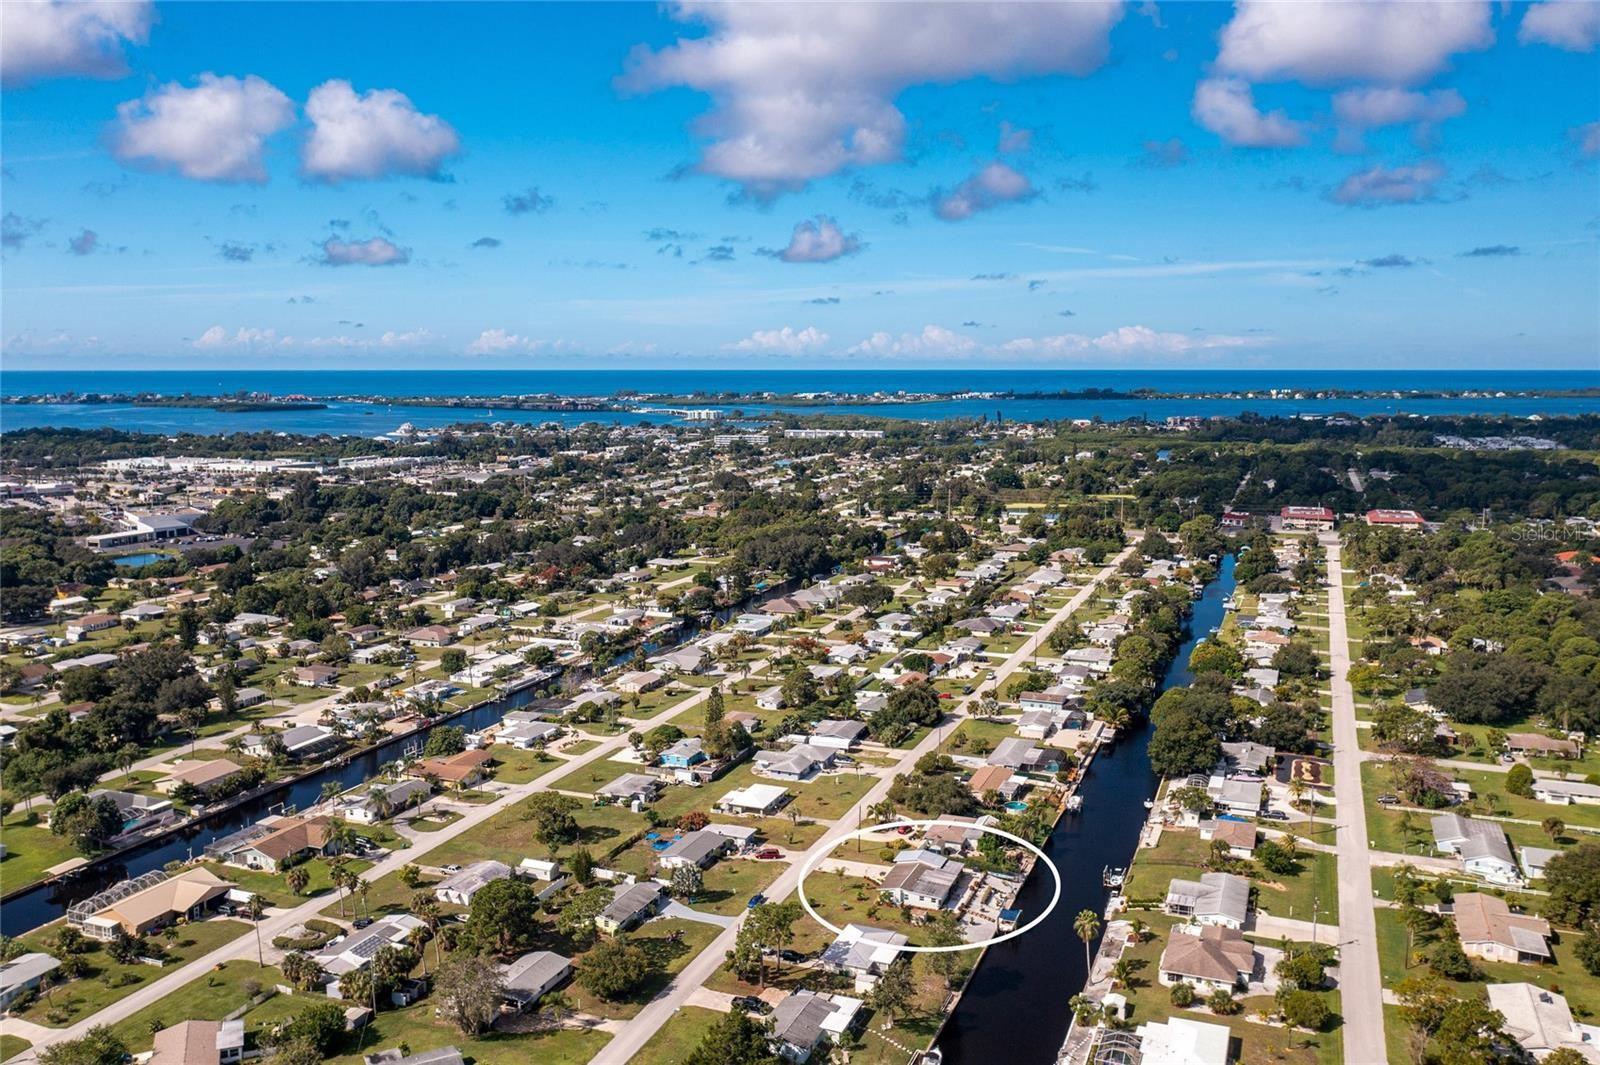 Photo of 878 E 6TH STREET, ENGLEWOOD, FL 34223 (MLS # D6121698)